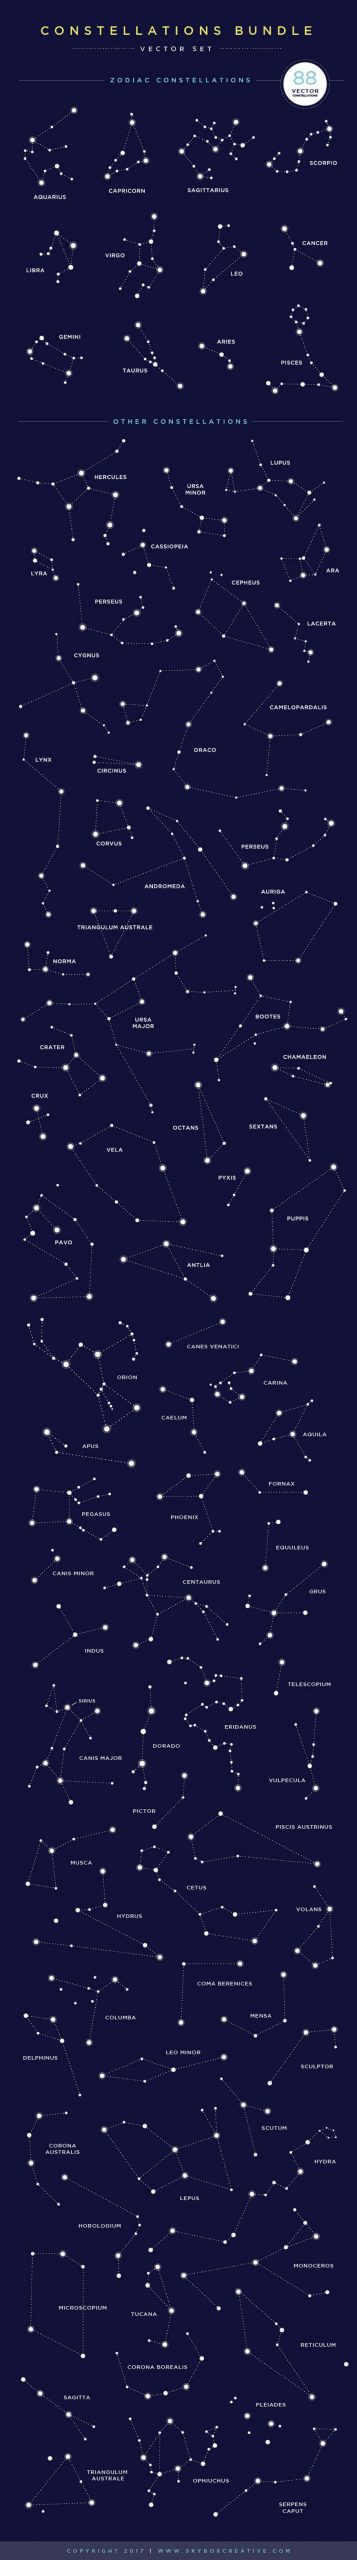 Creative Graphic Design - Cosmic Bundle: Constellation Set-1 - 3